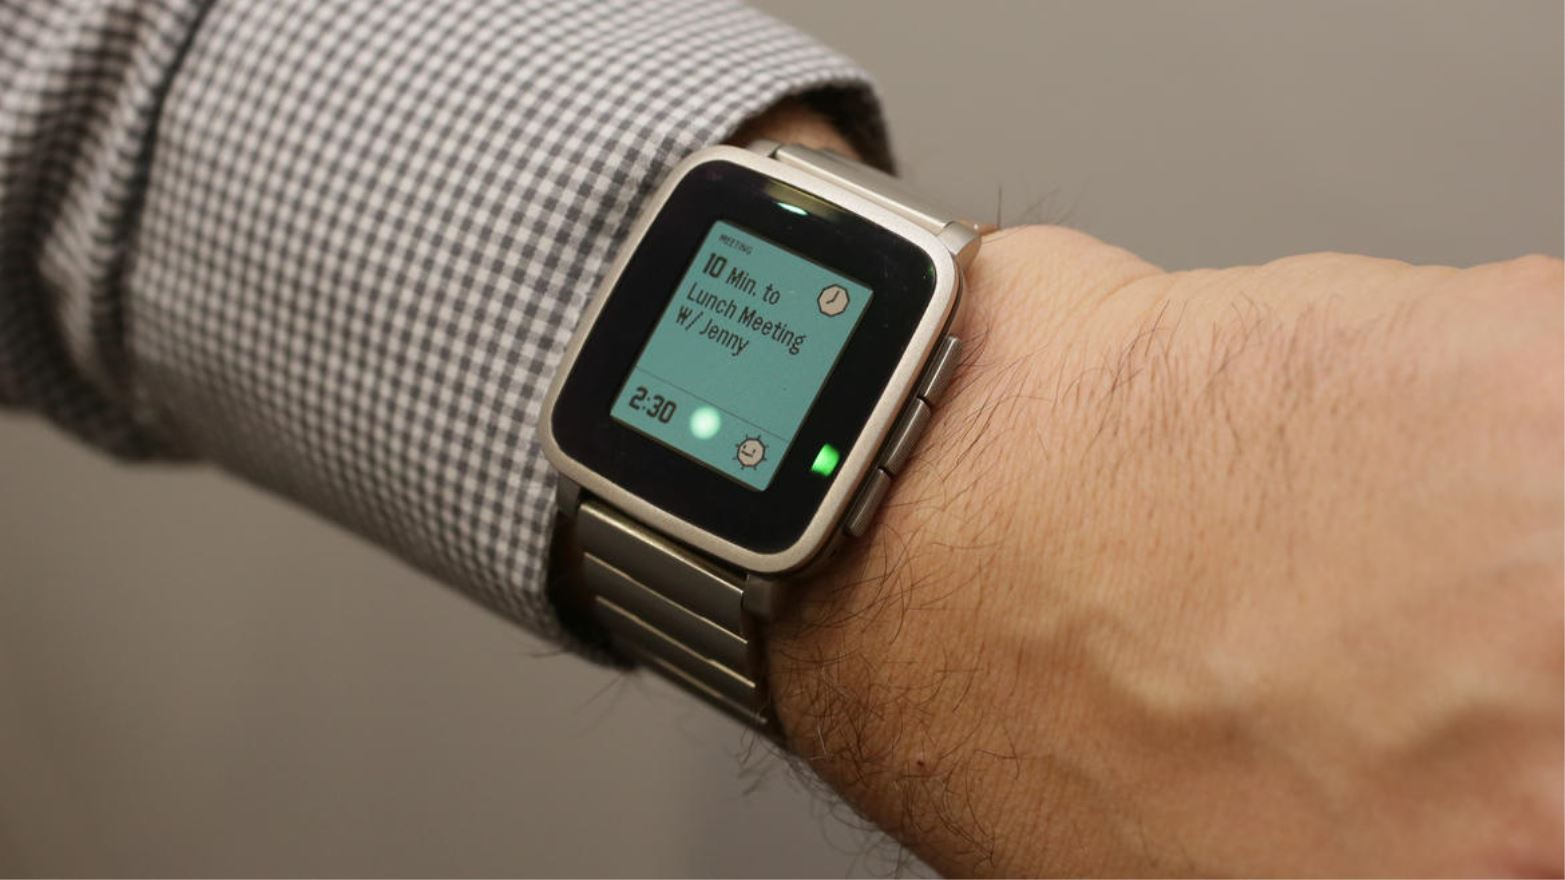 Pebble verbetert Health-platform en voegt sms-functie toe